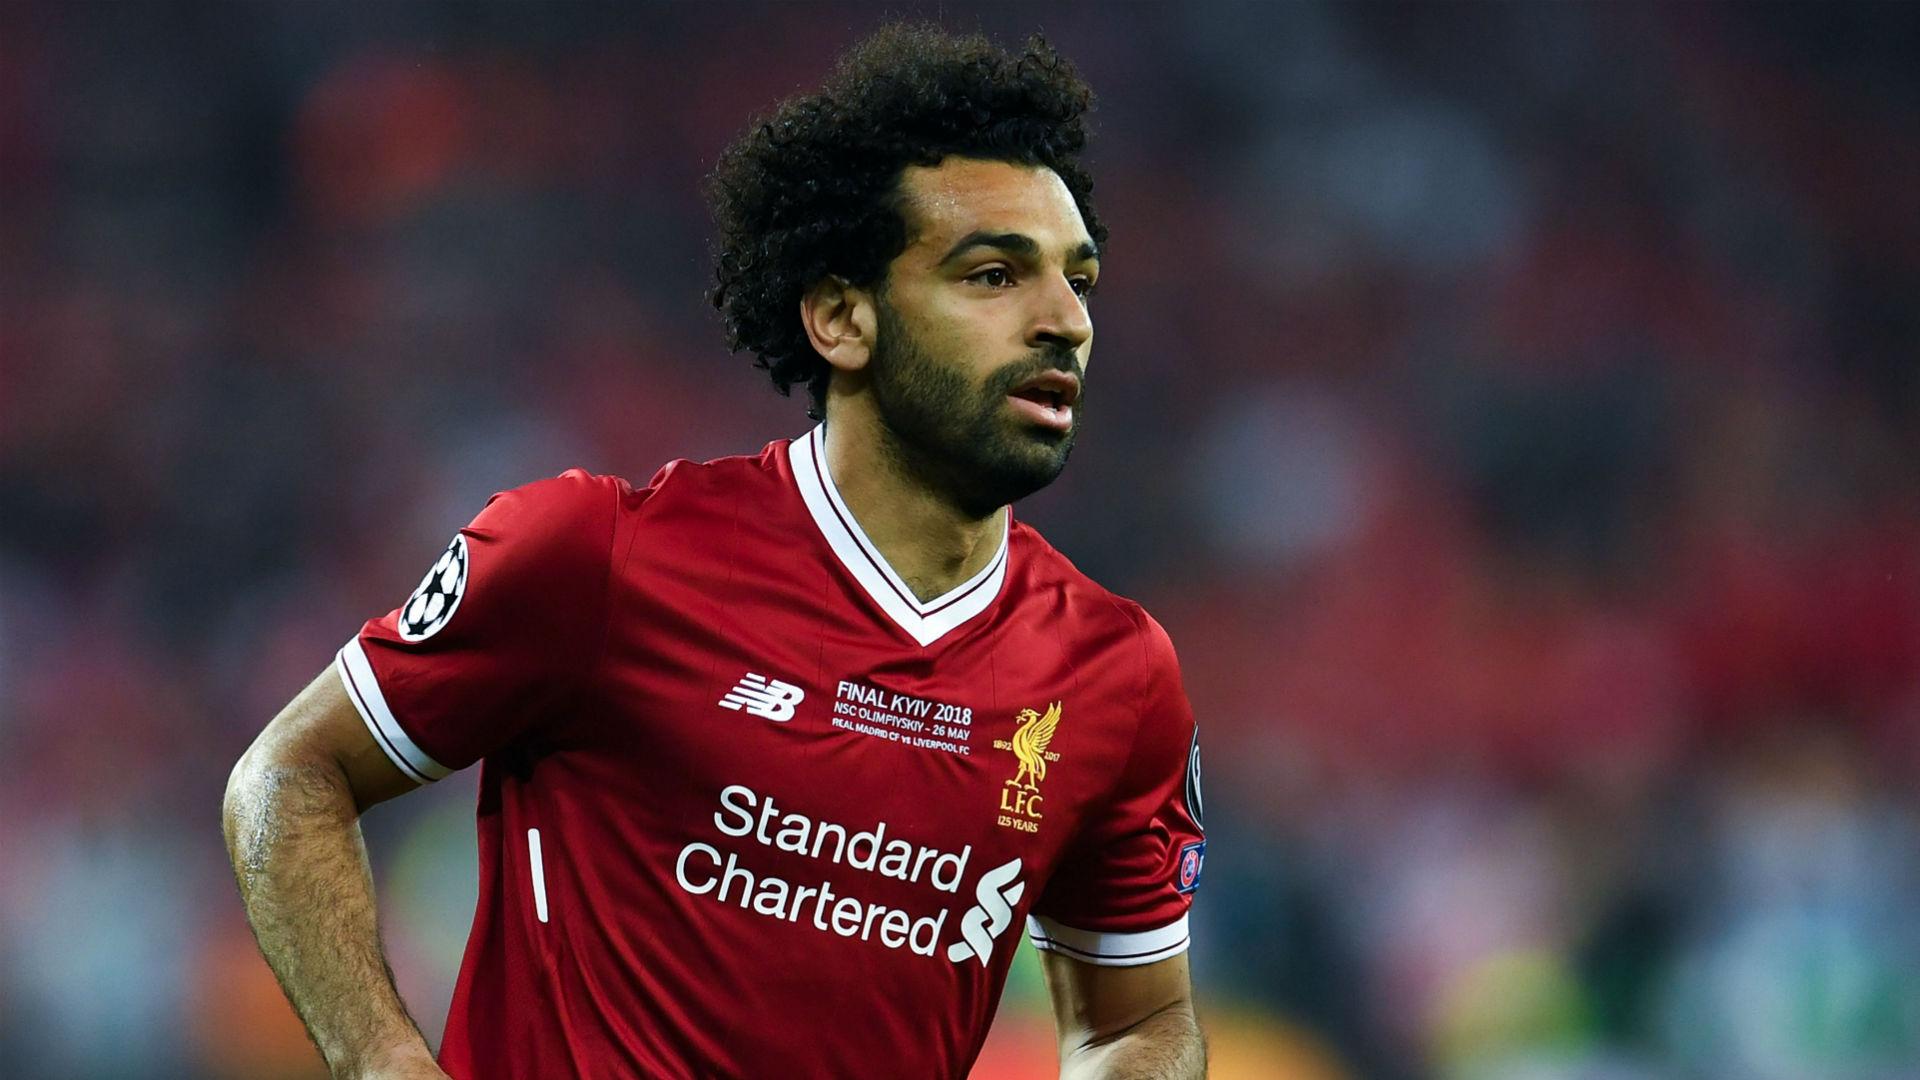 Seconda Maglia Liverpool Mohamed Salah